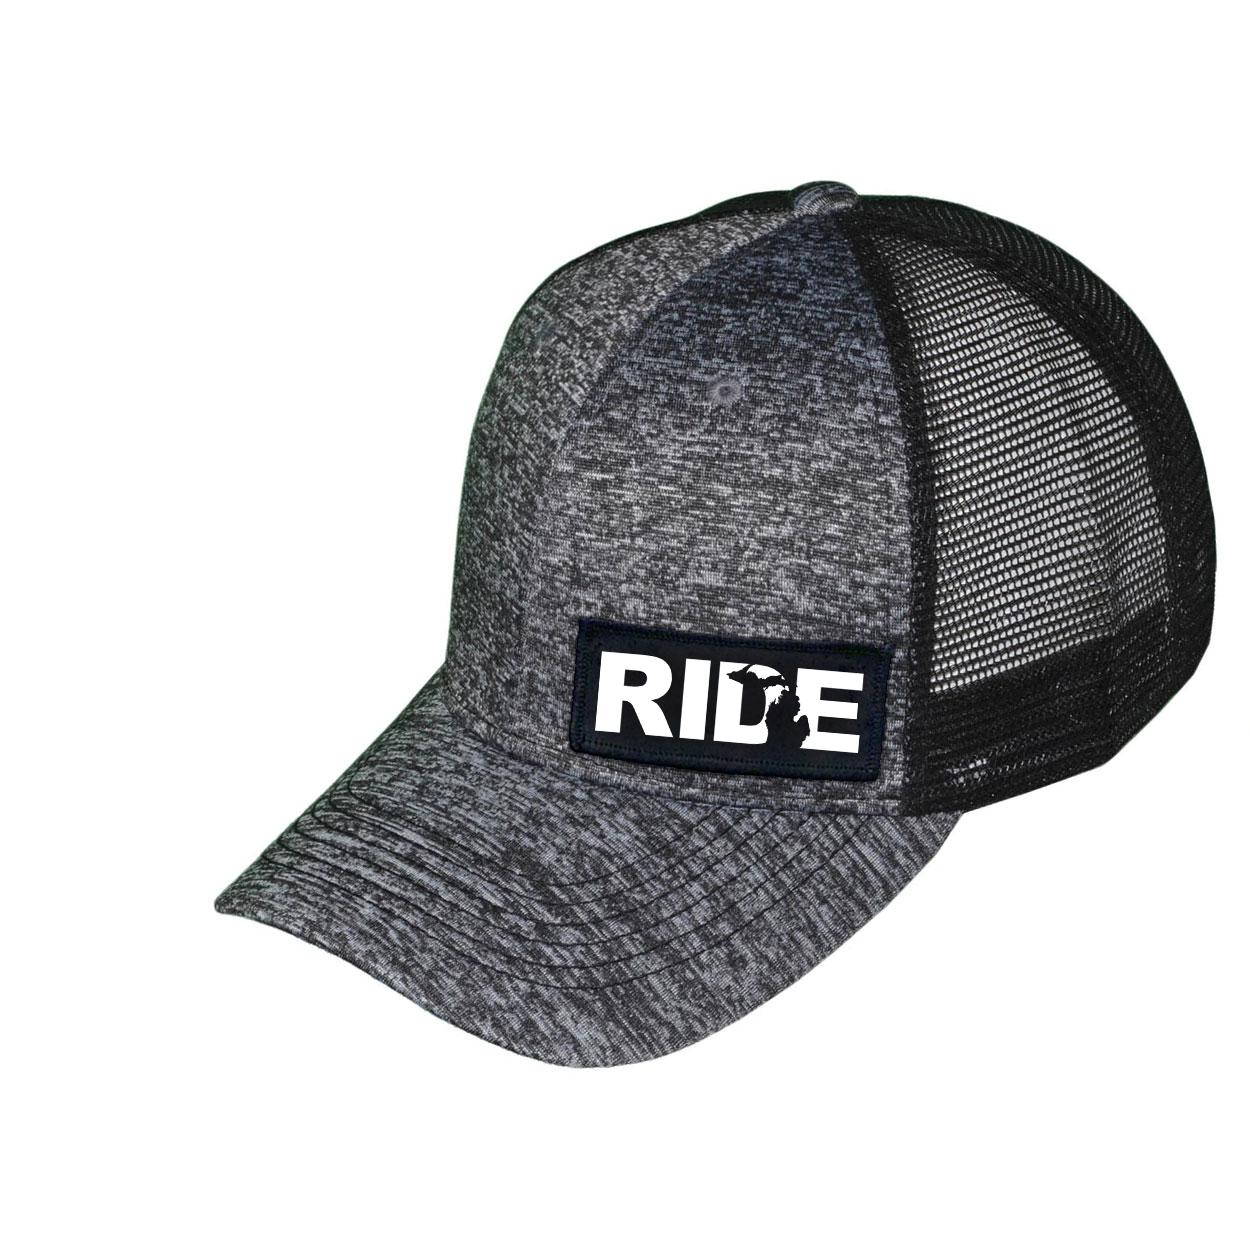 Ride Michigan Night Out Woven Patch Melange Snapback Trucker Hat Gray/Black (White Logo)